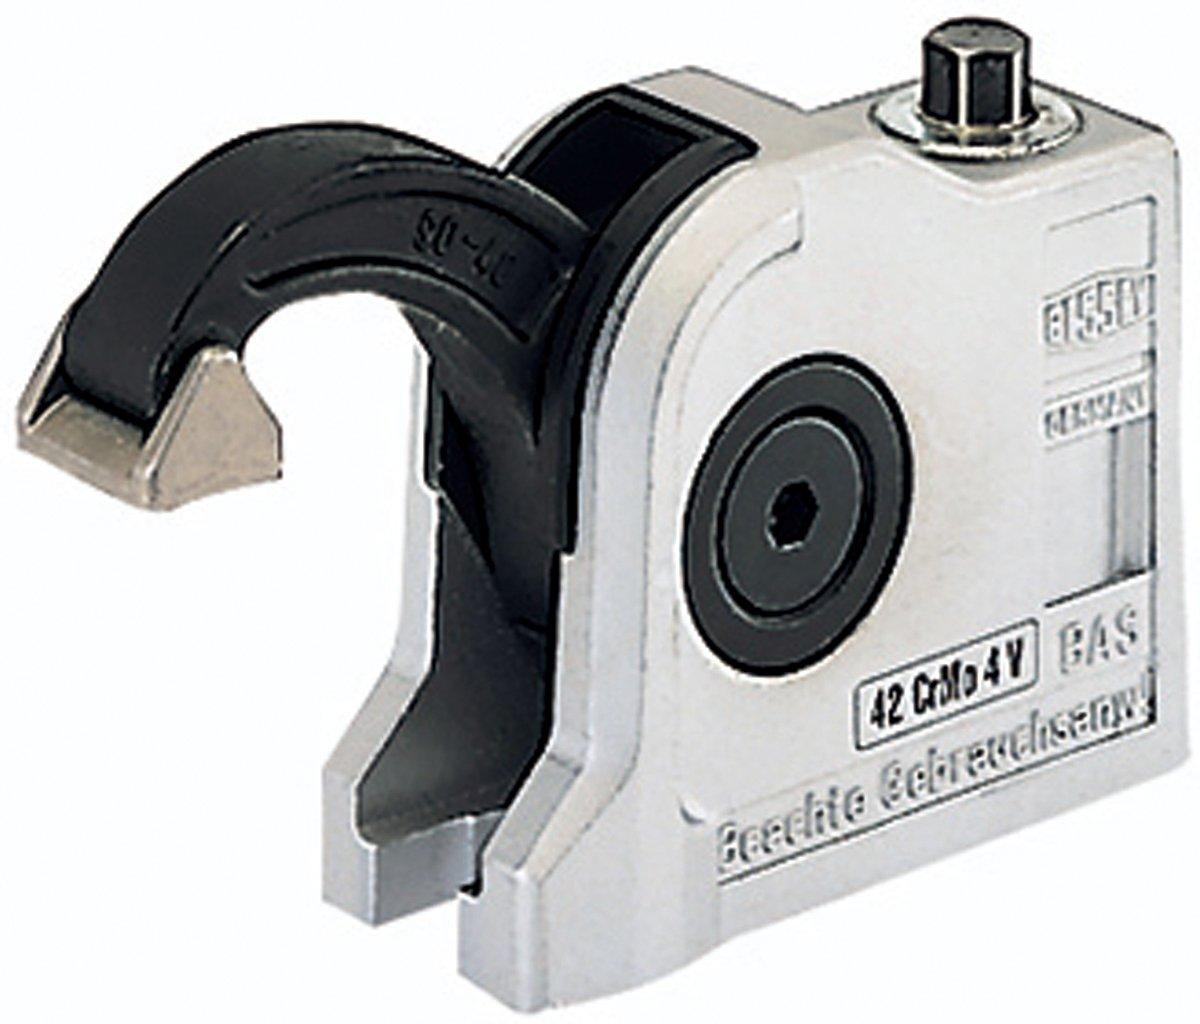 Bessey 7639500020 BAS-C compact-Spanner BAS-C10-6